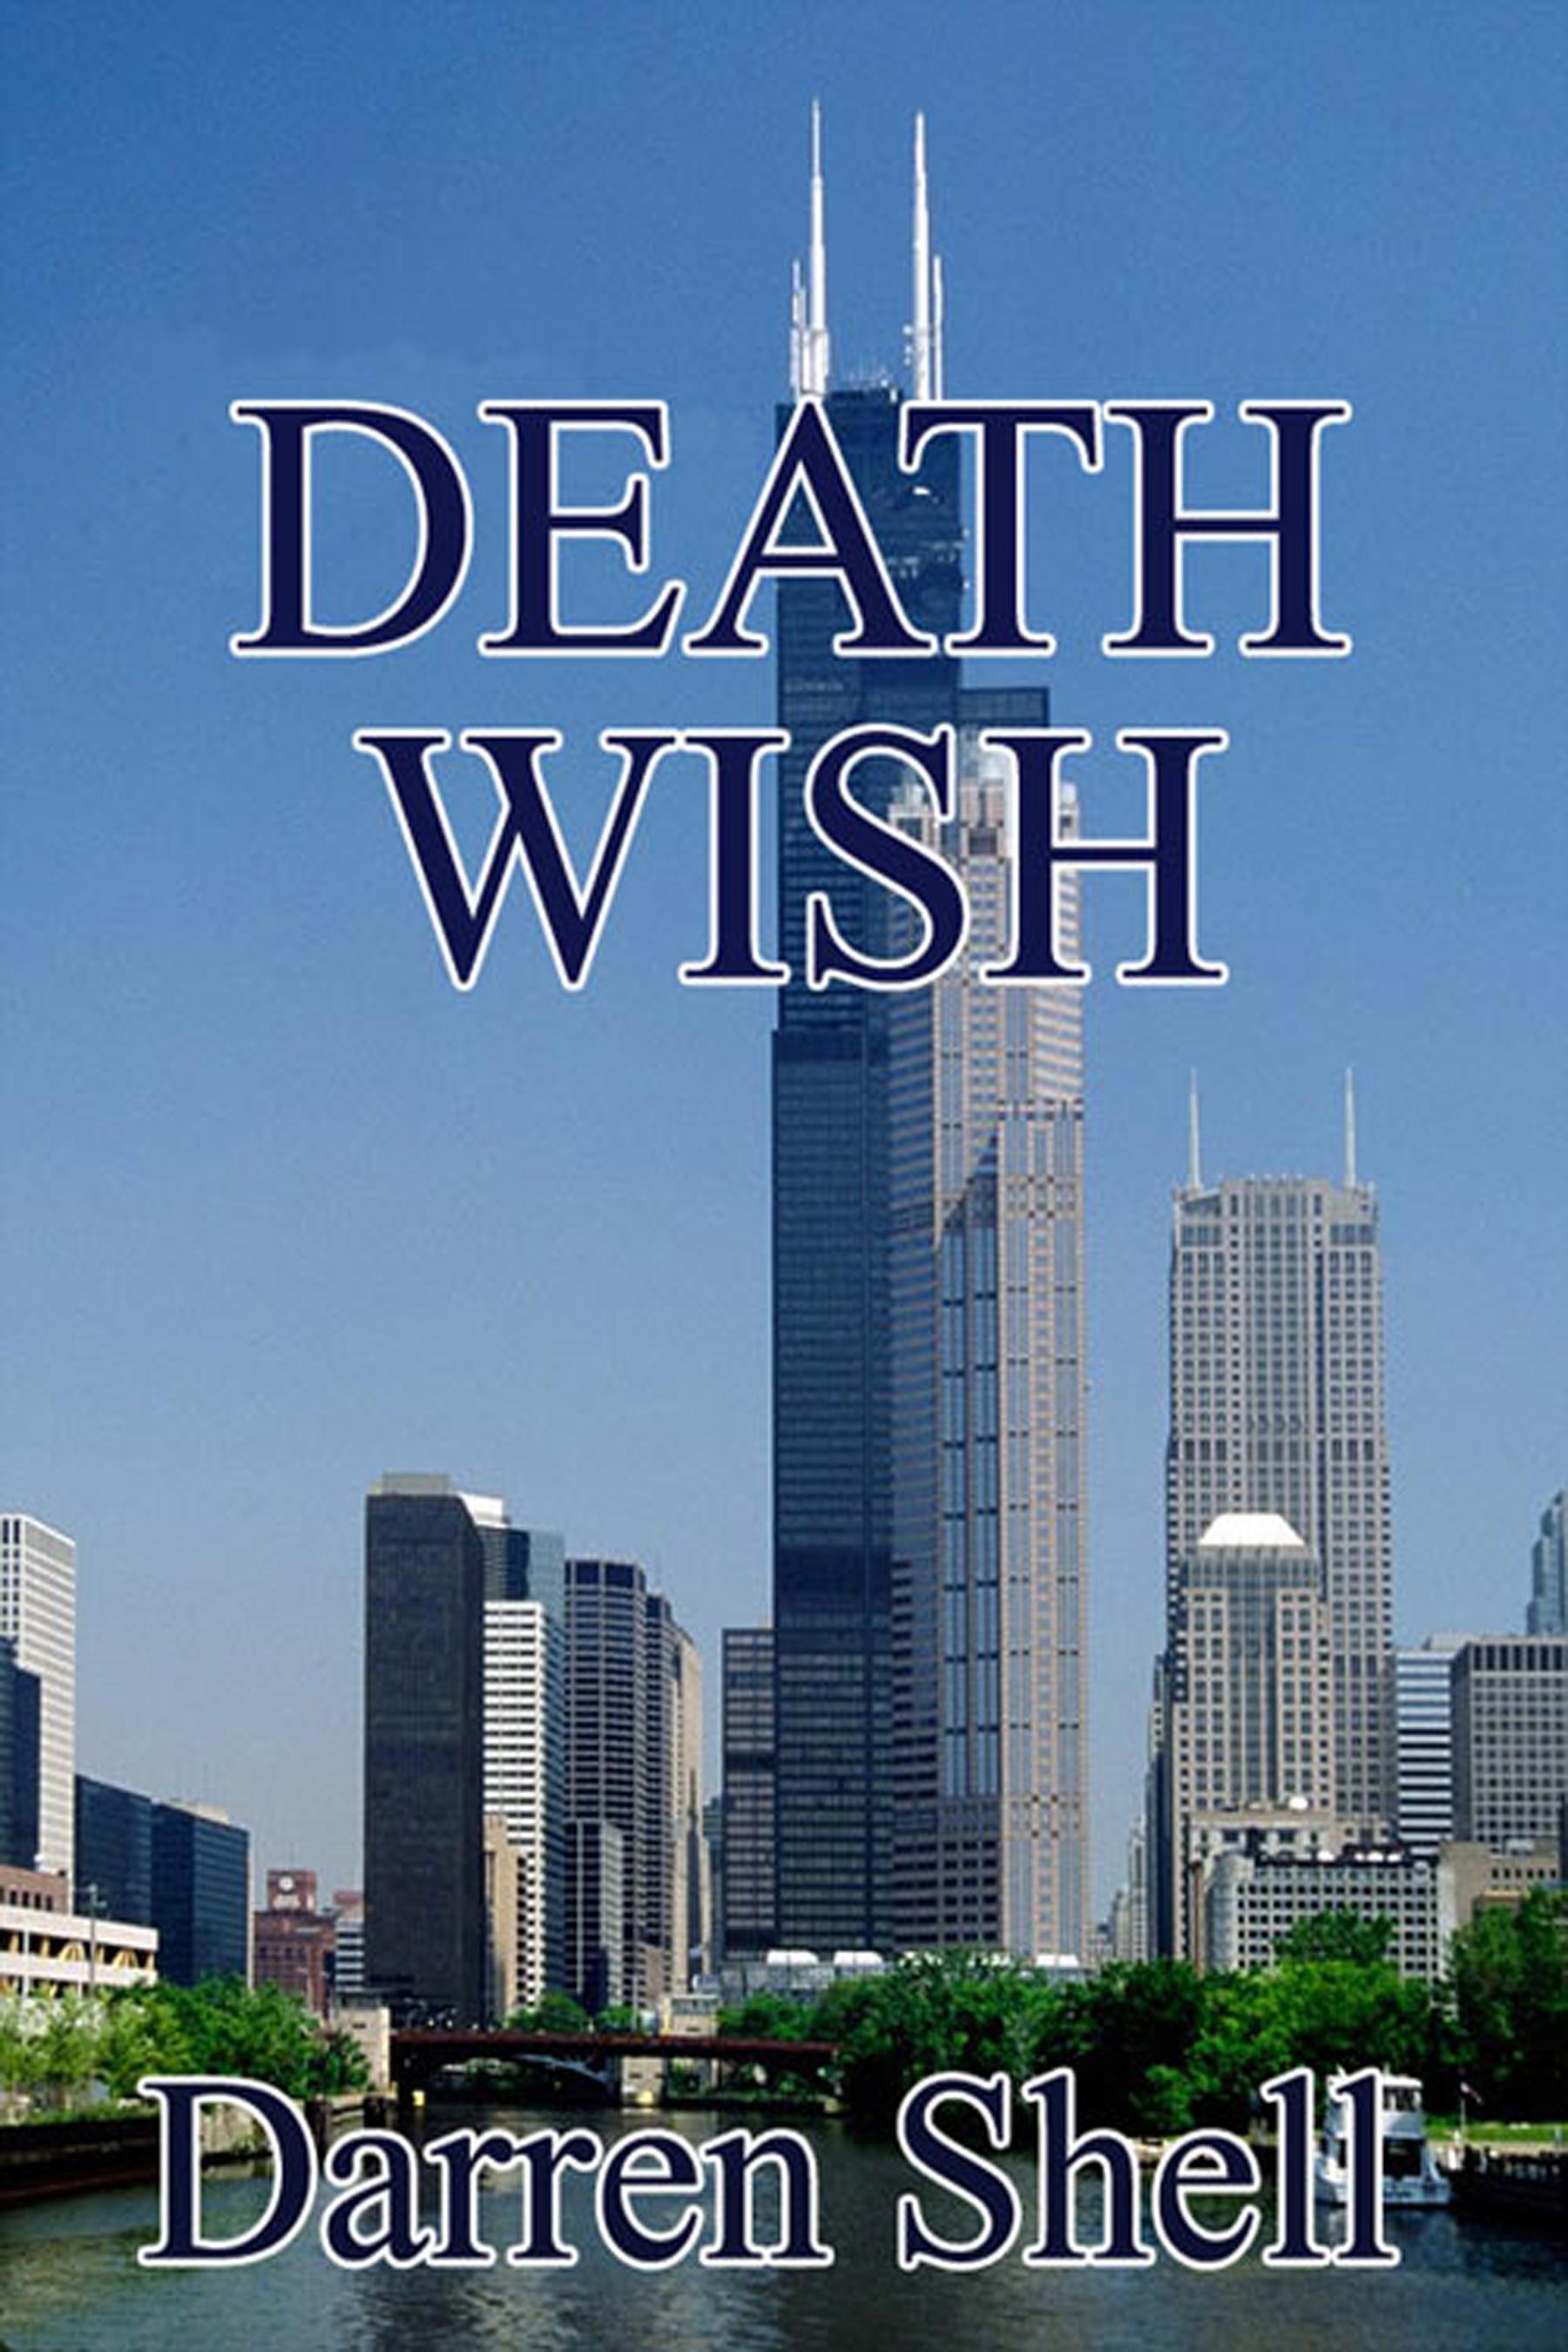 Death Wish, an Ebook by Darren Shell